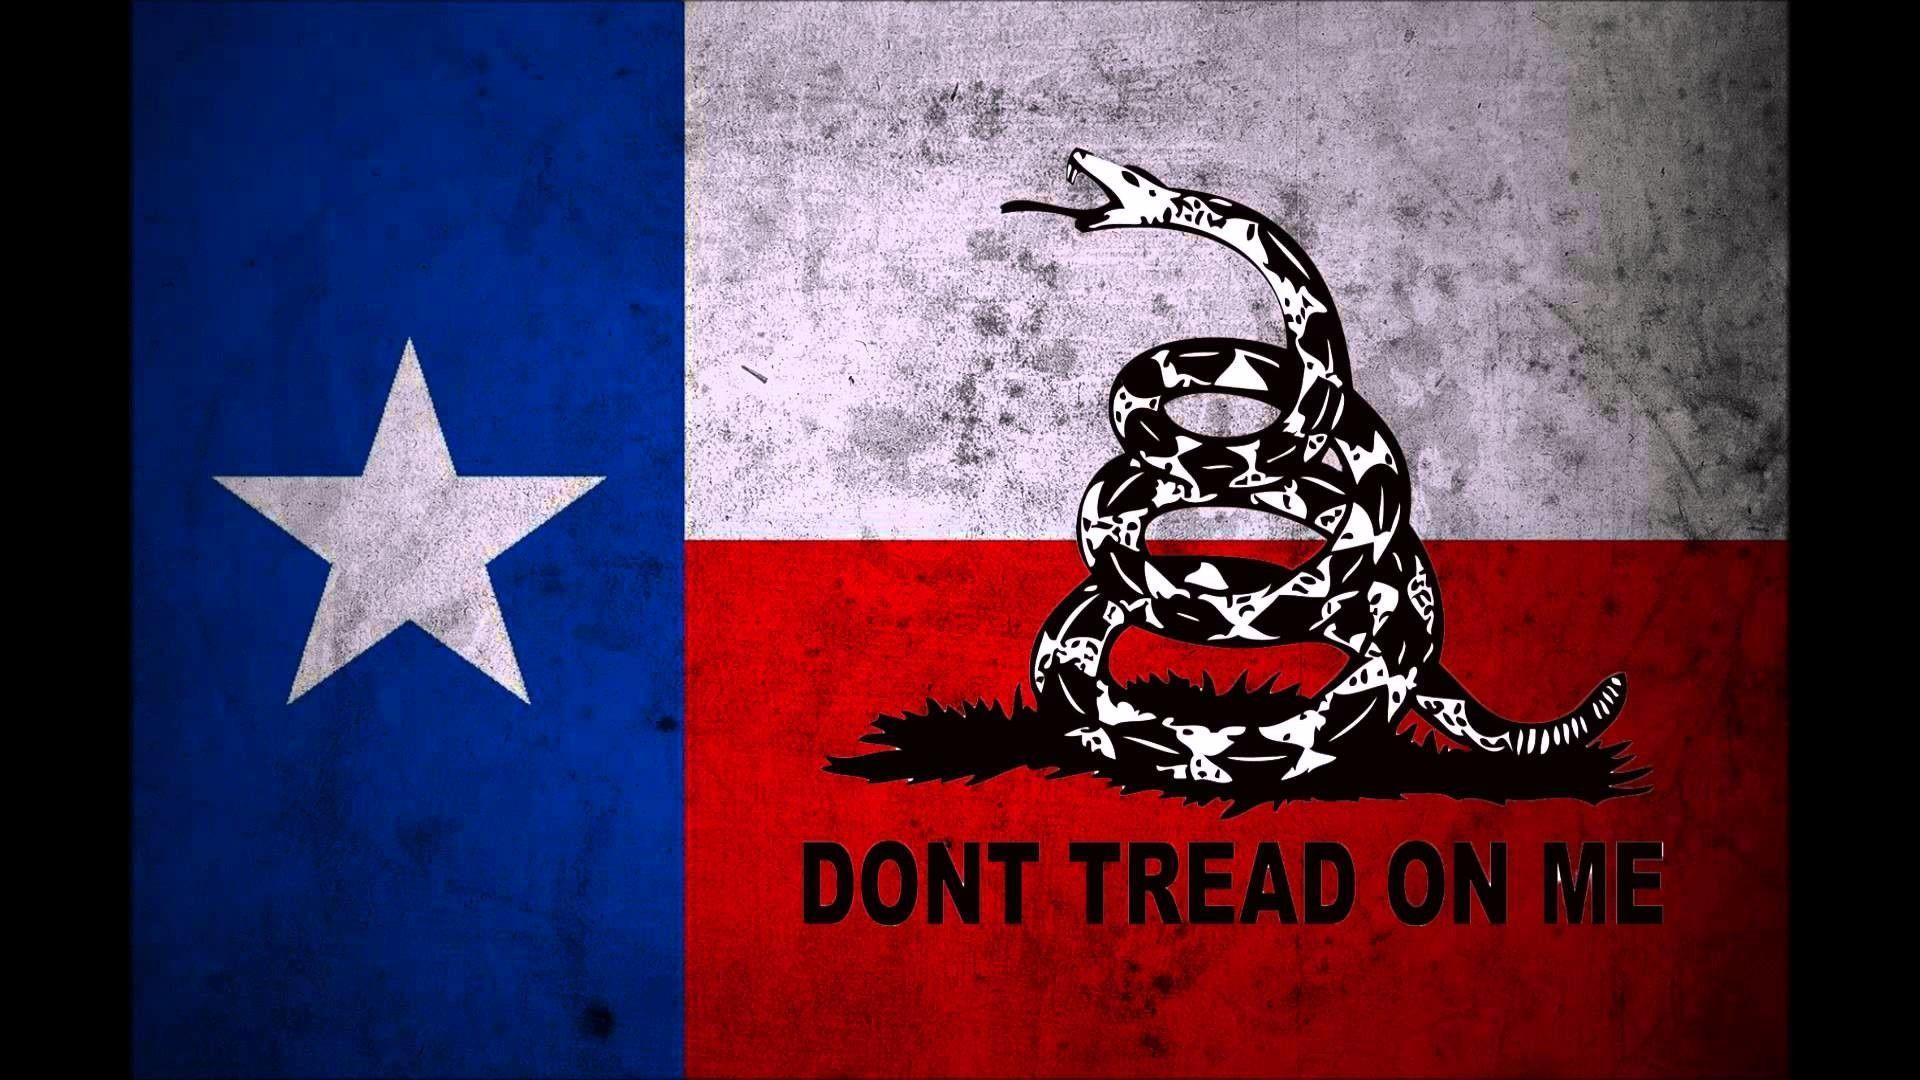 Texas flag wallpapers top free texas flag backgrounds wallpaperaccess - Texas flag wallpaper ...